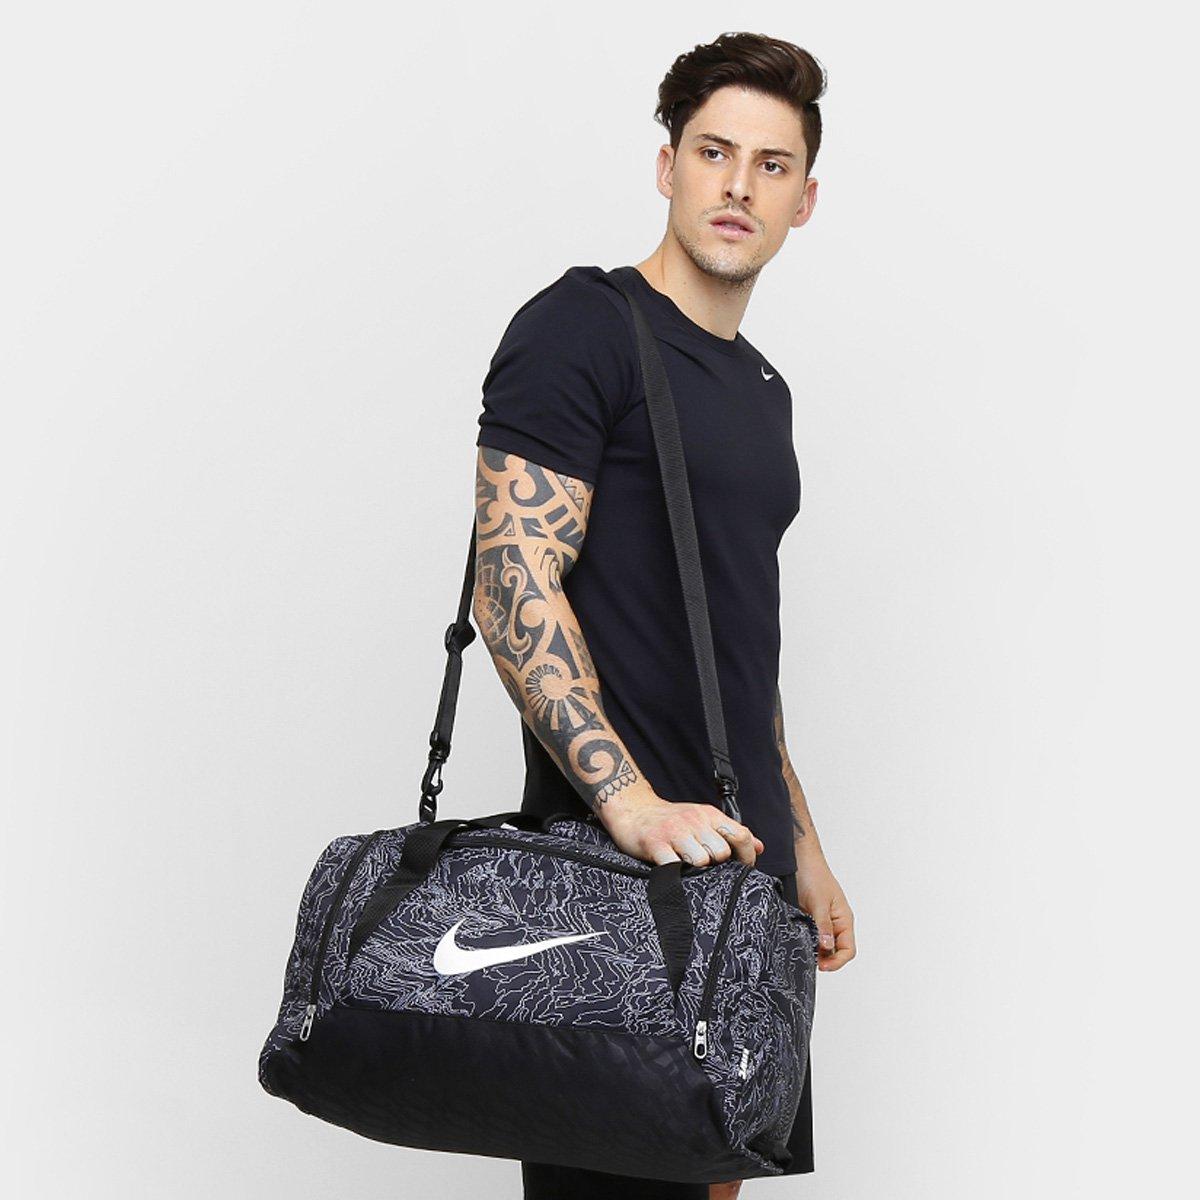 Bolsa Nike Brasilia 6 Duffel Graphic Masculina - Compre Agora  068b6d60a1a7b